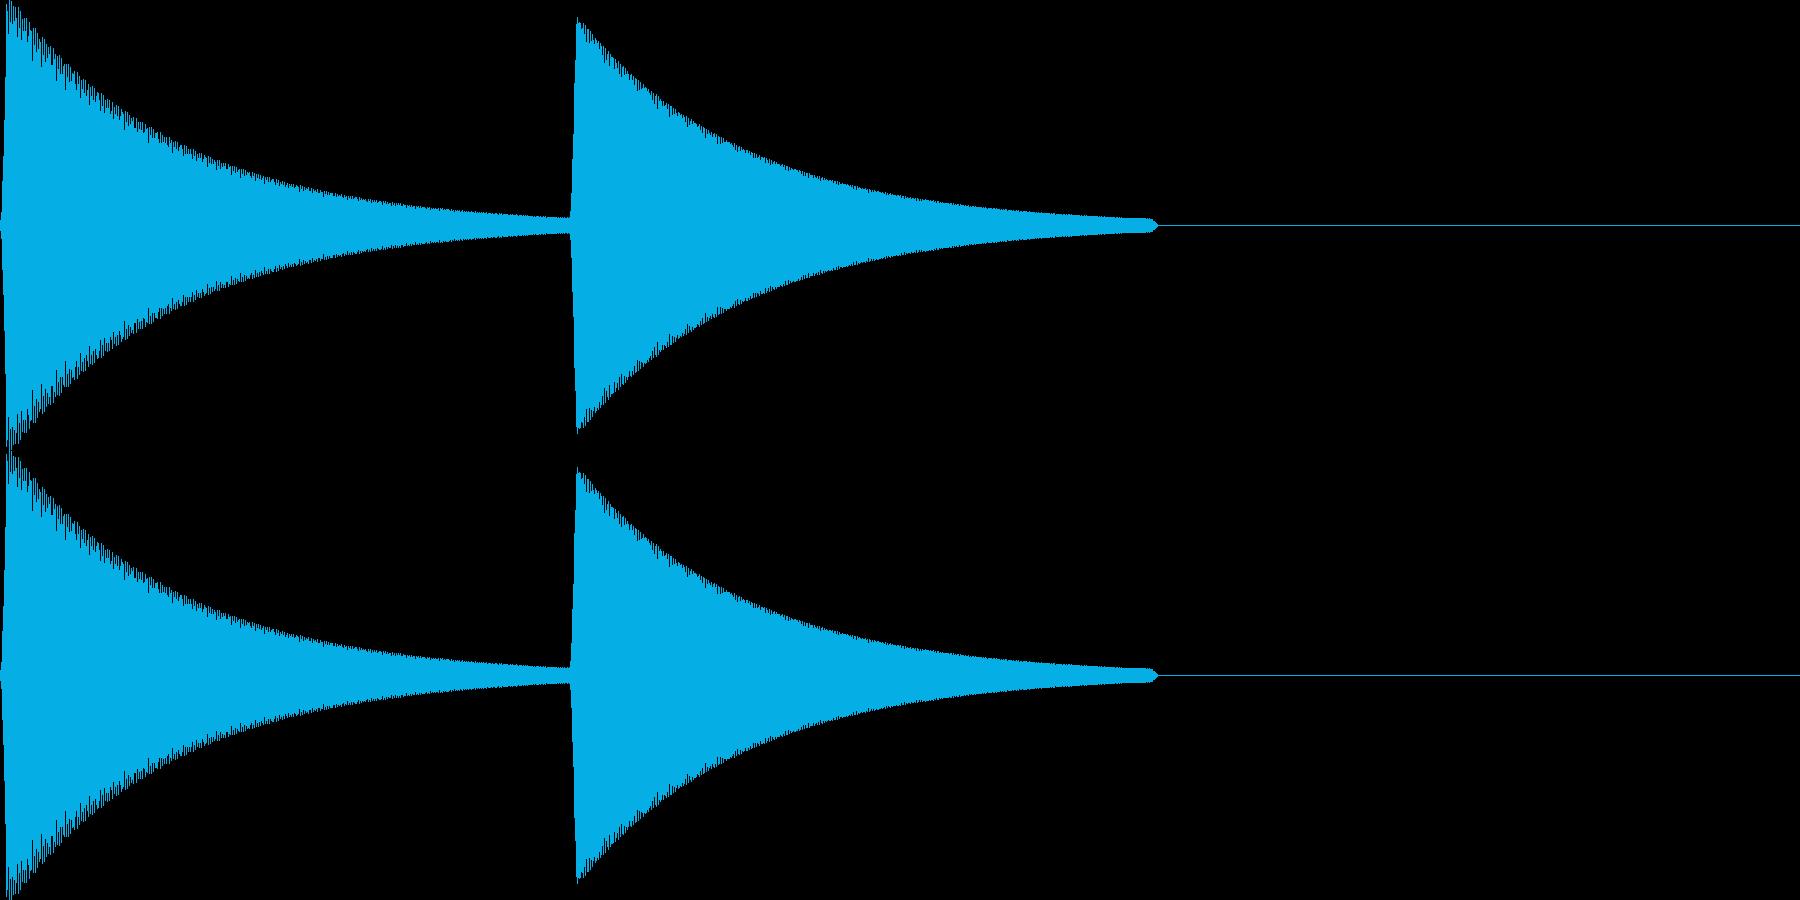 【SE】決定音12(ピプ)の再生済みの波形